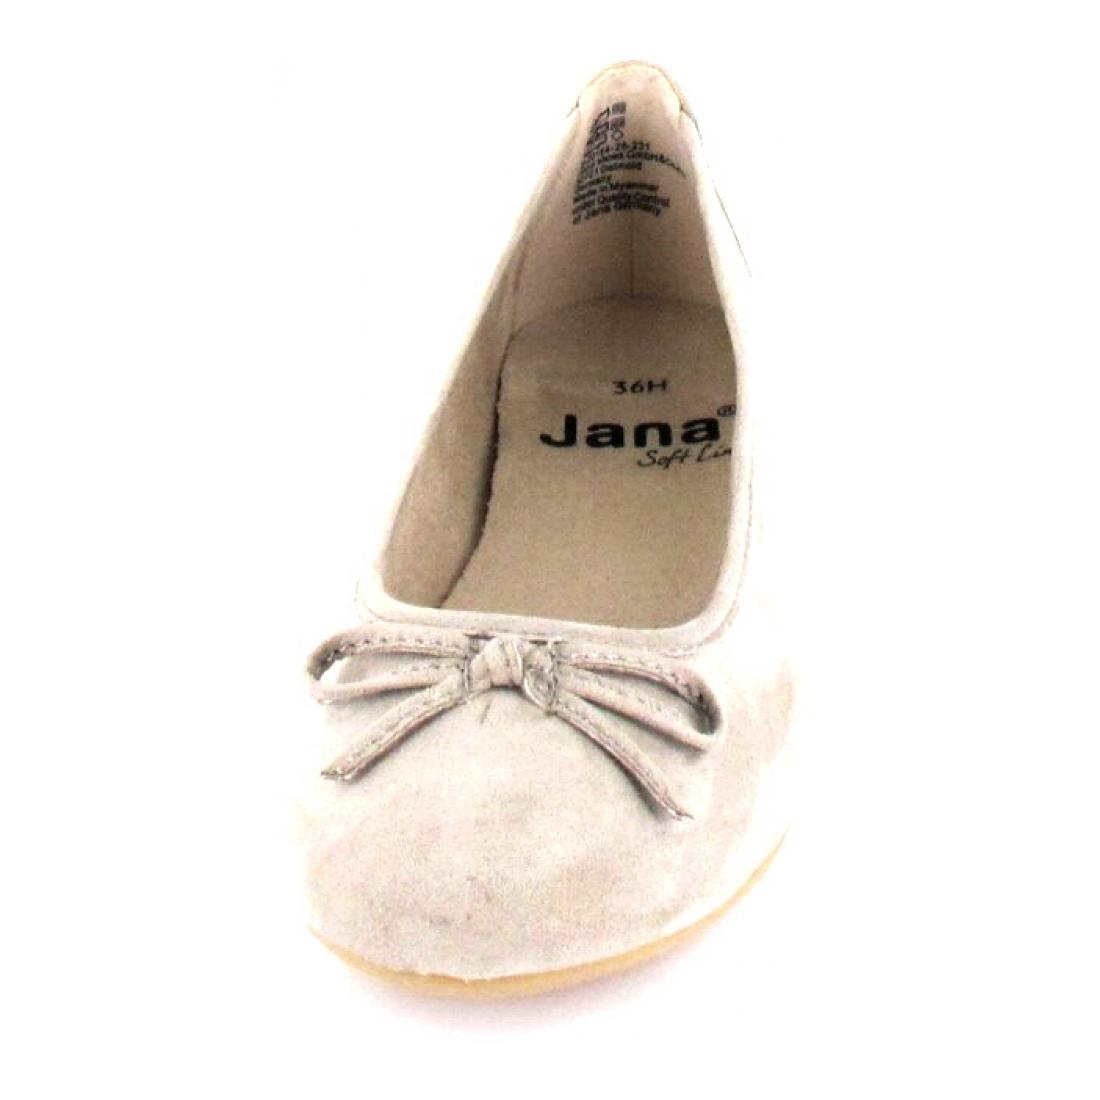 Jana Ballerina